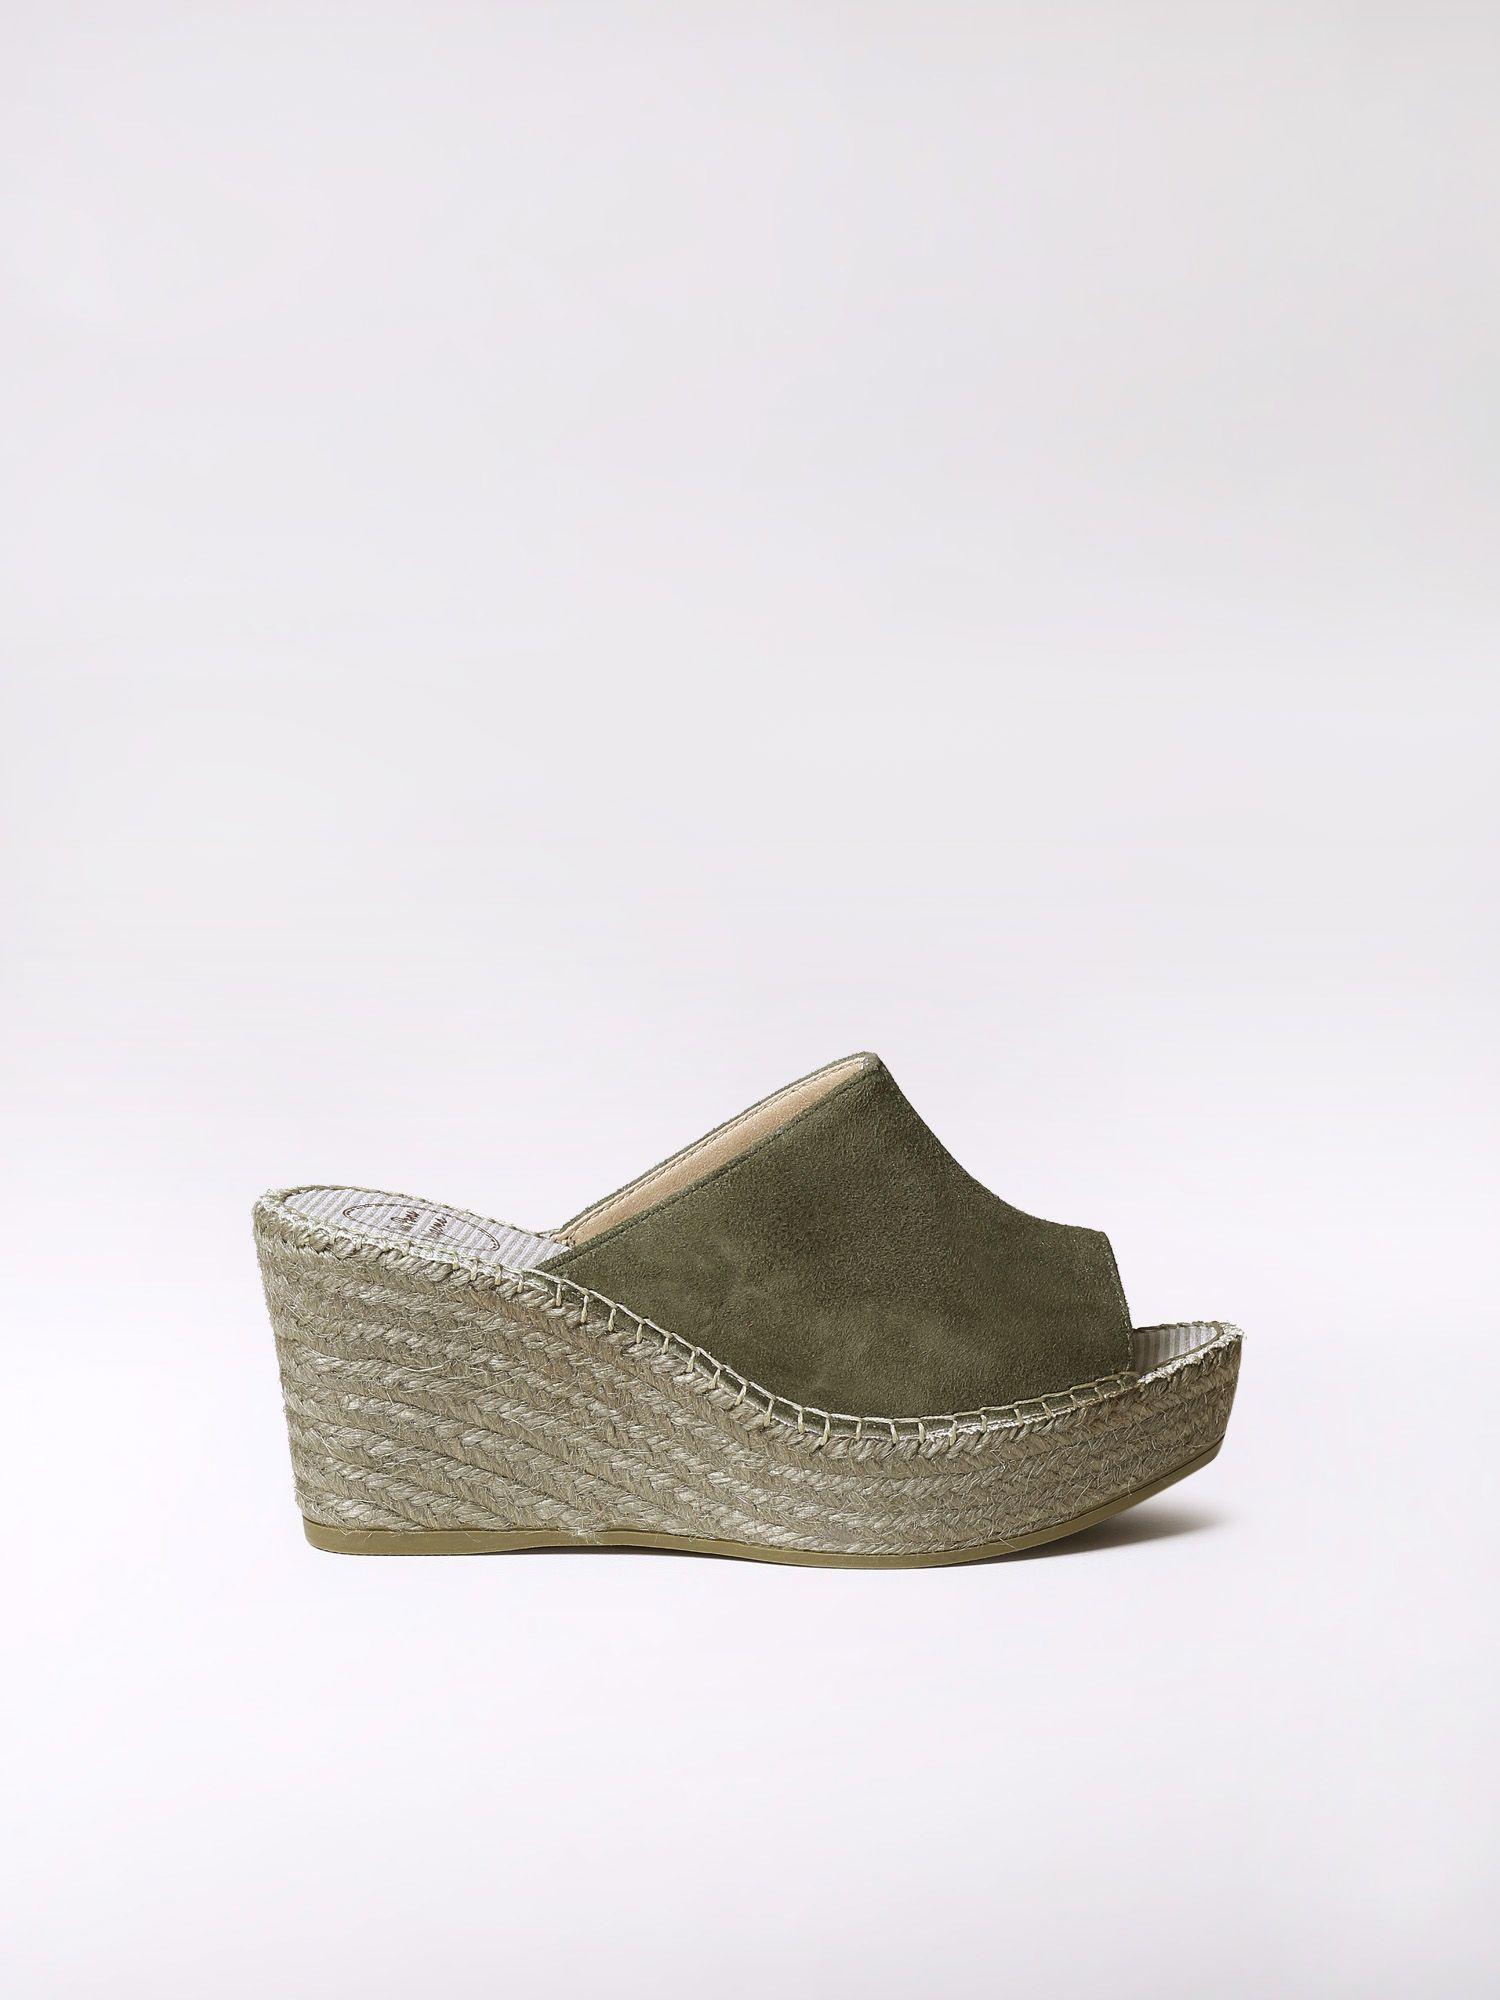 Flatform espadrille clog design - LORENA-A